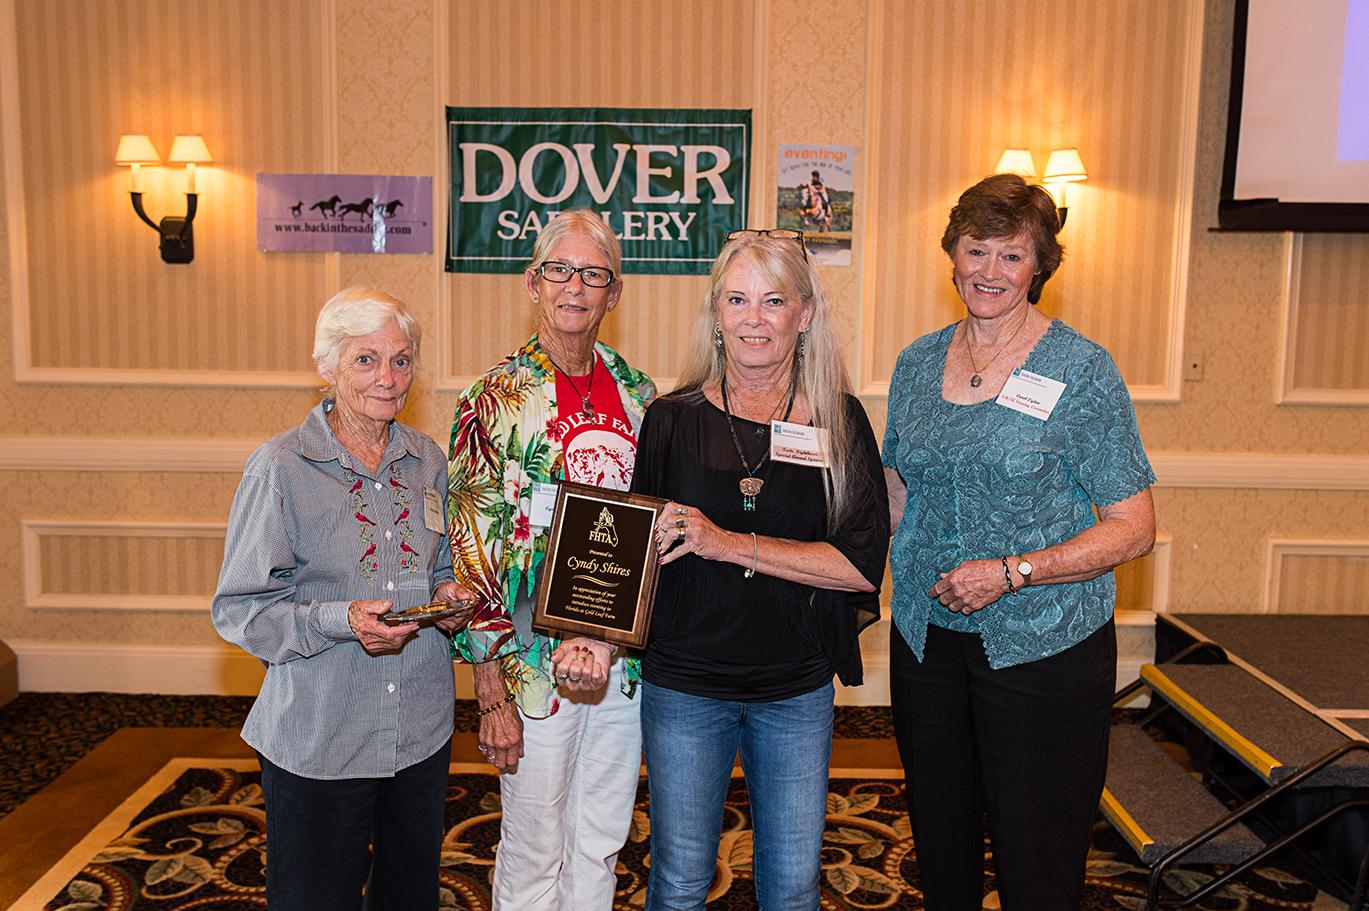 Alicia Wishard Memorial Award being presented to Cyndy Shires